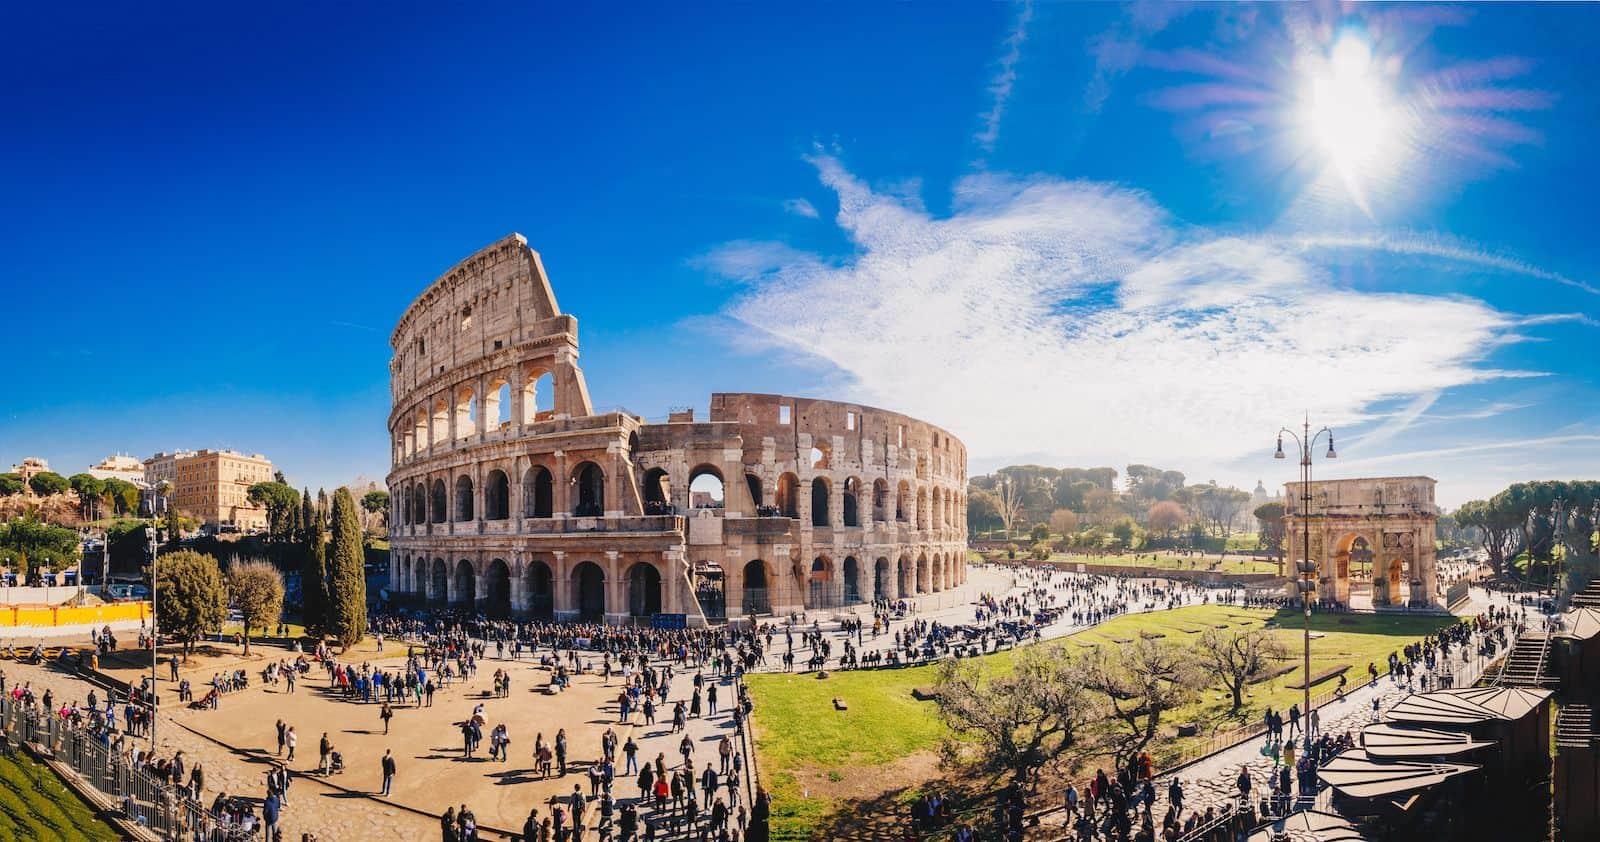 Colosseum or Coliseum, also known as the Flavian Amphitheatre